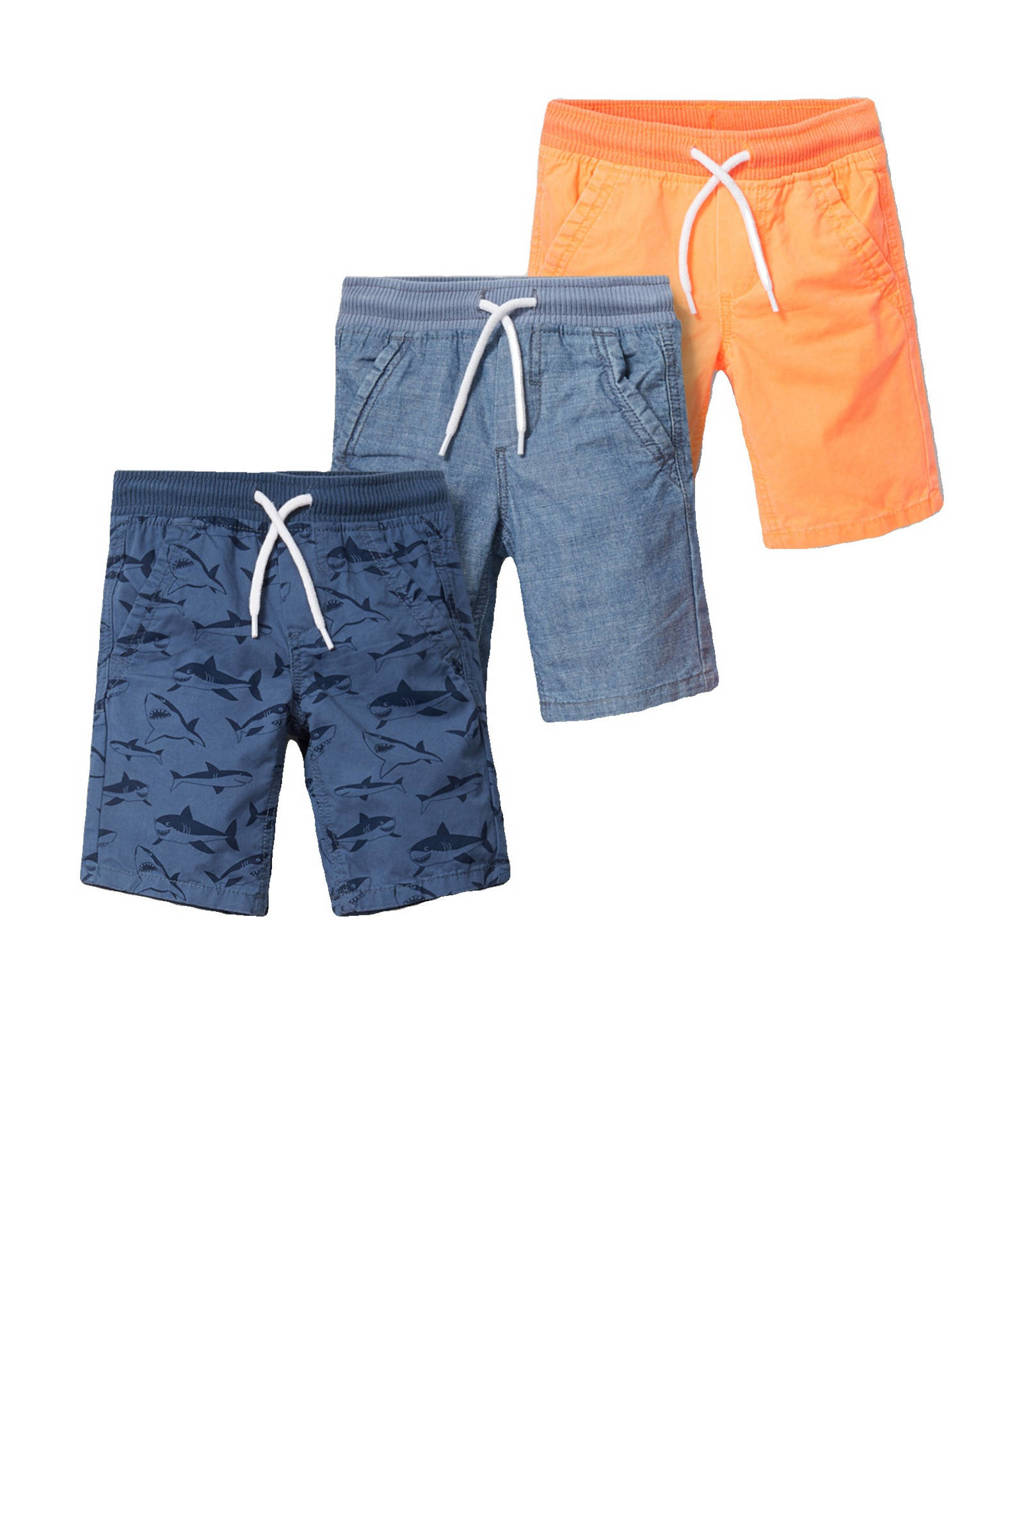 C&A Palomino bermuda - set van 3 blauw/oranje, Blauw/oranje